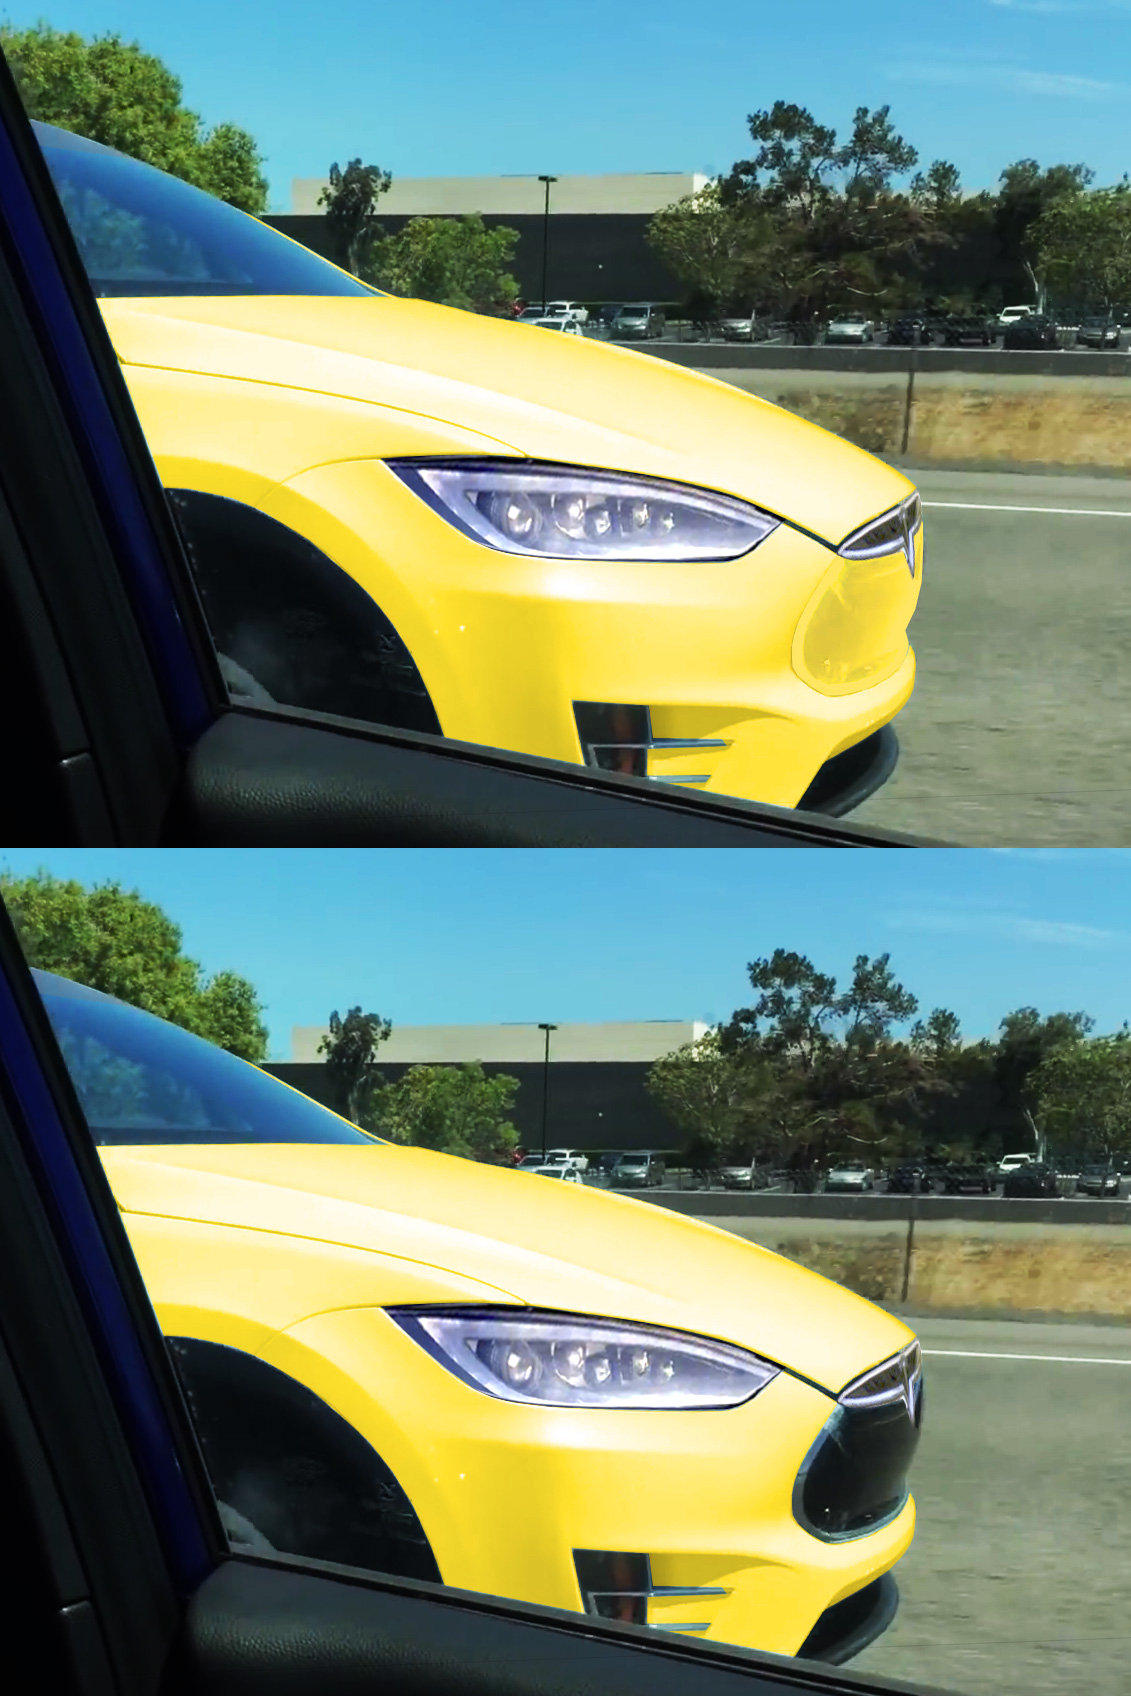 model_x_concept_yellow-jpg.91133